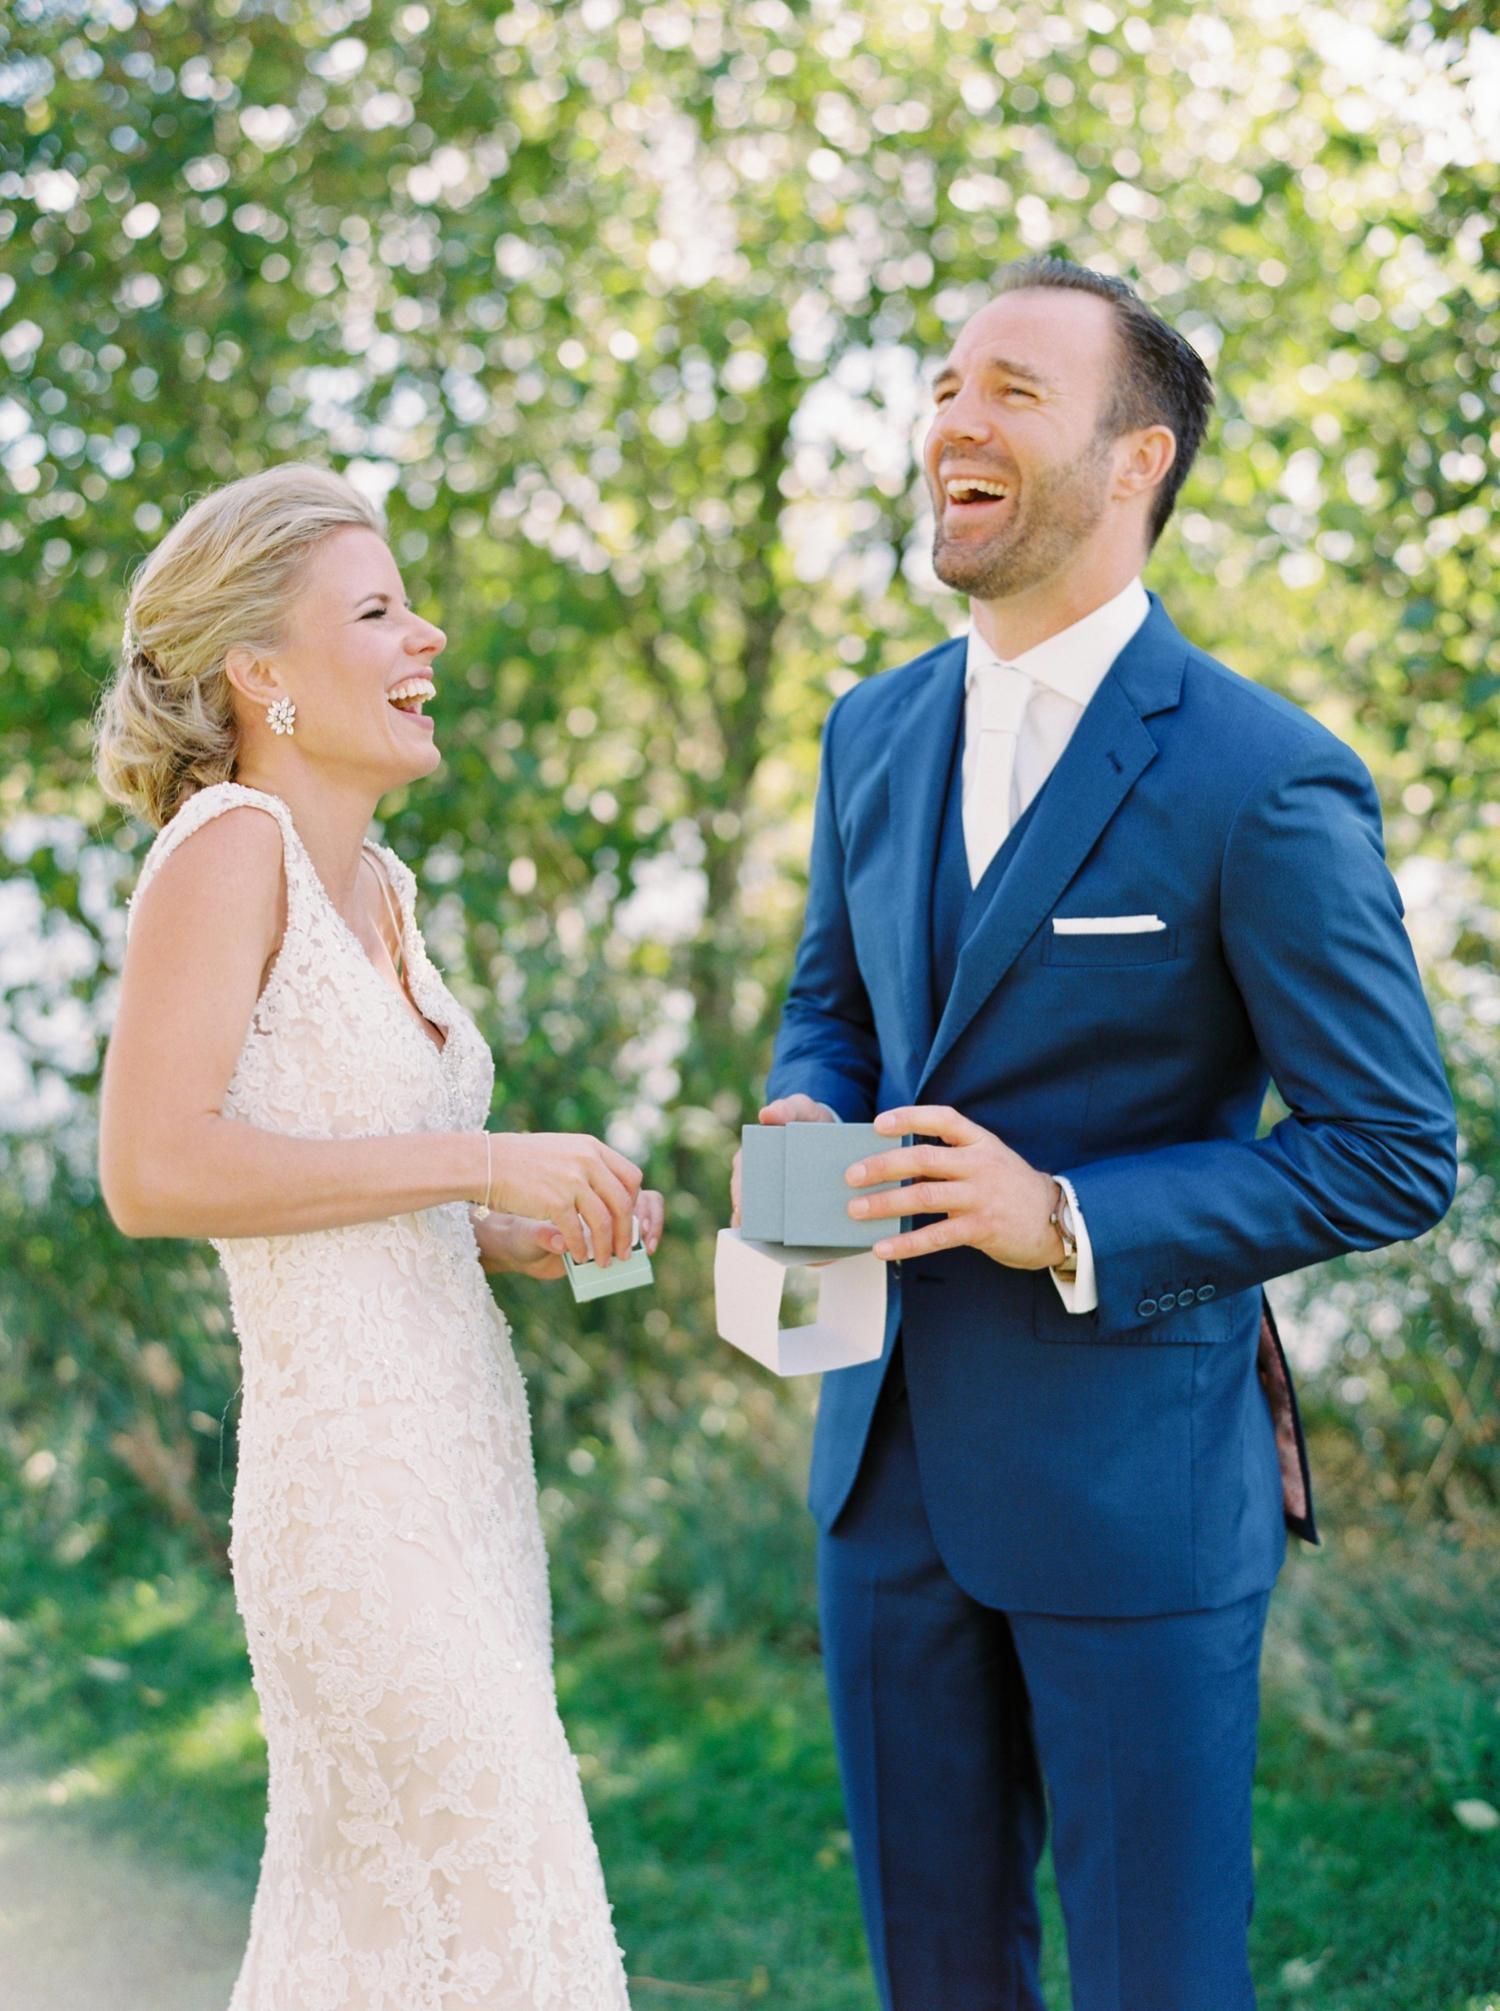 Calgary wedding photographers | oregon wedding photographers | fine art film | Justine Milton Photography | oregon wedding | bride and groom portraits | bride and groom laughing